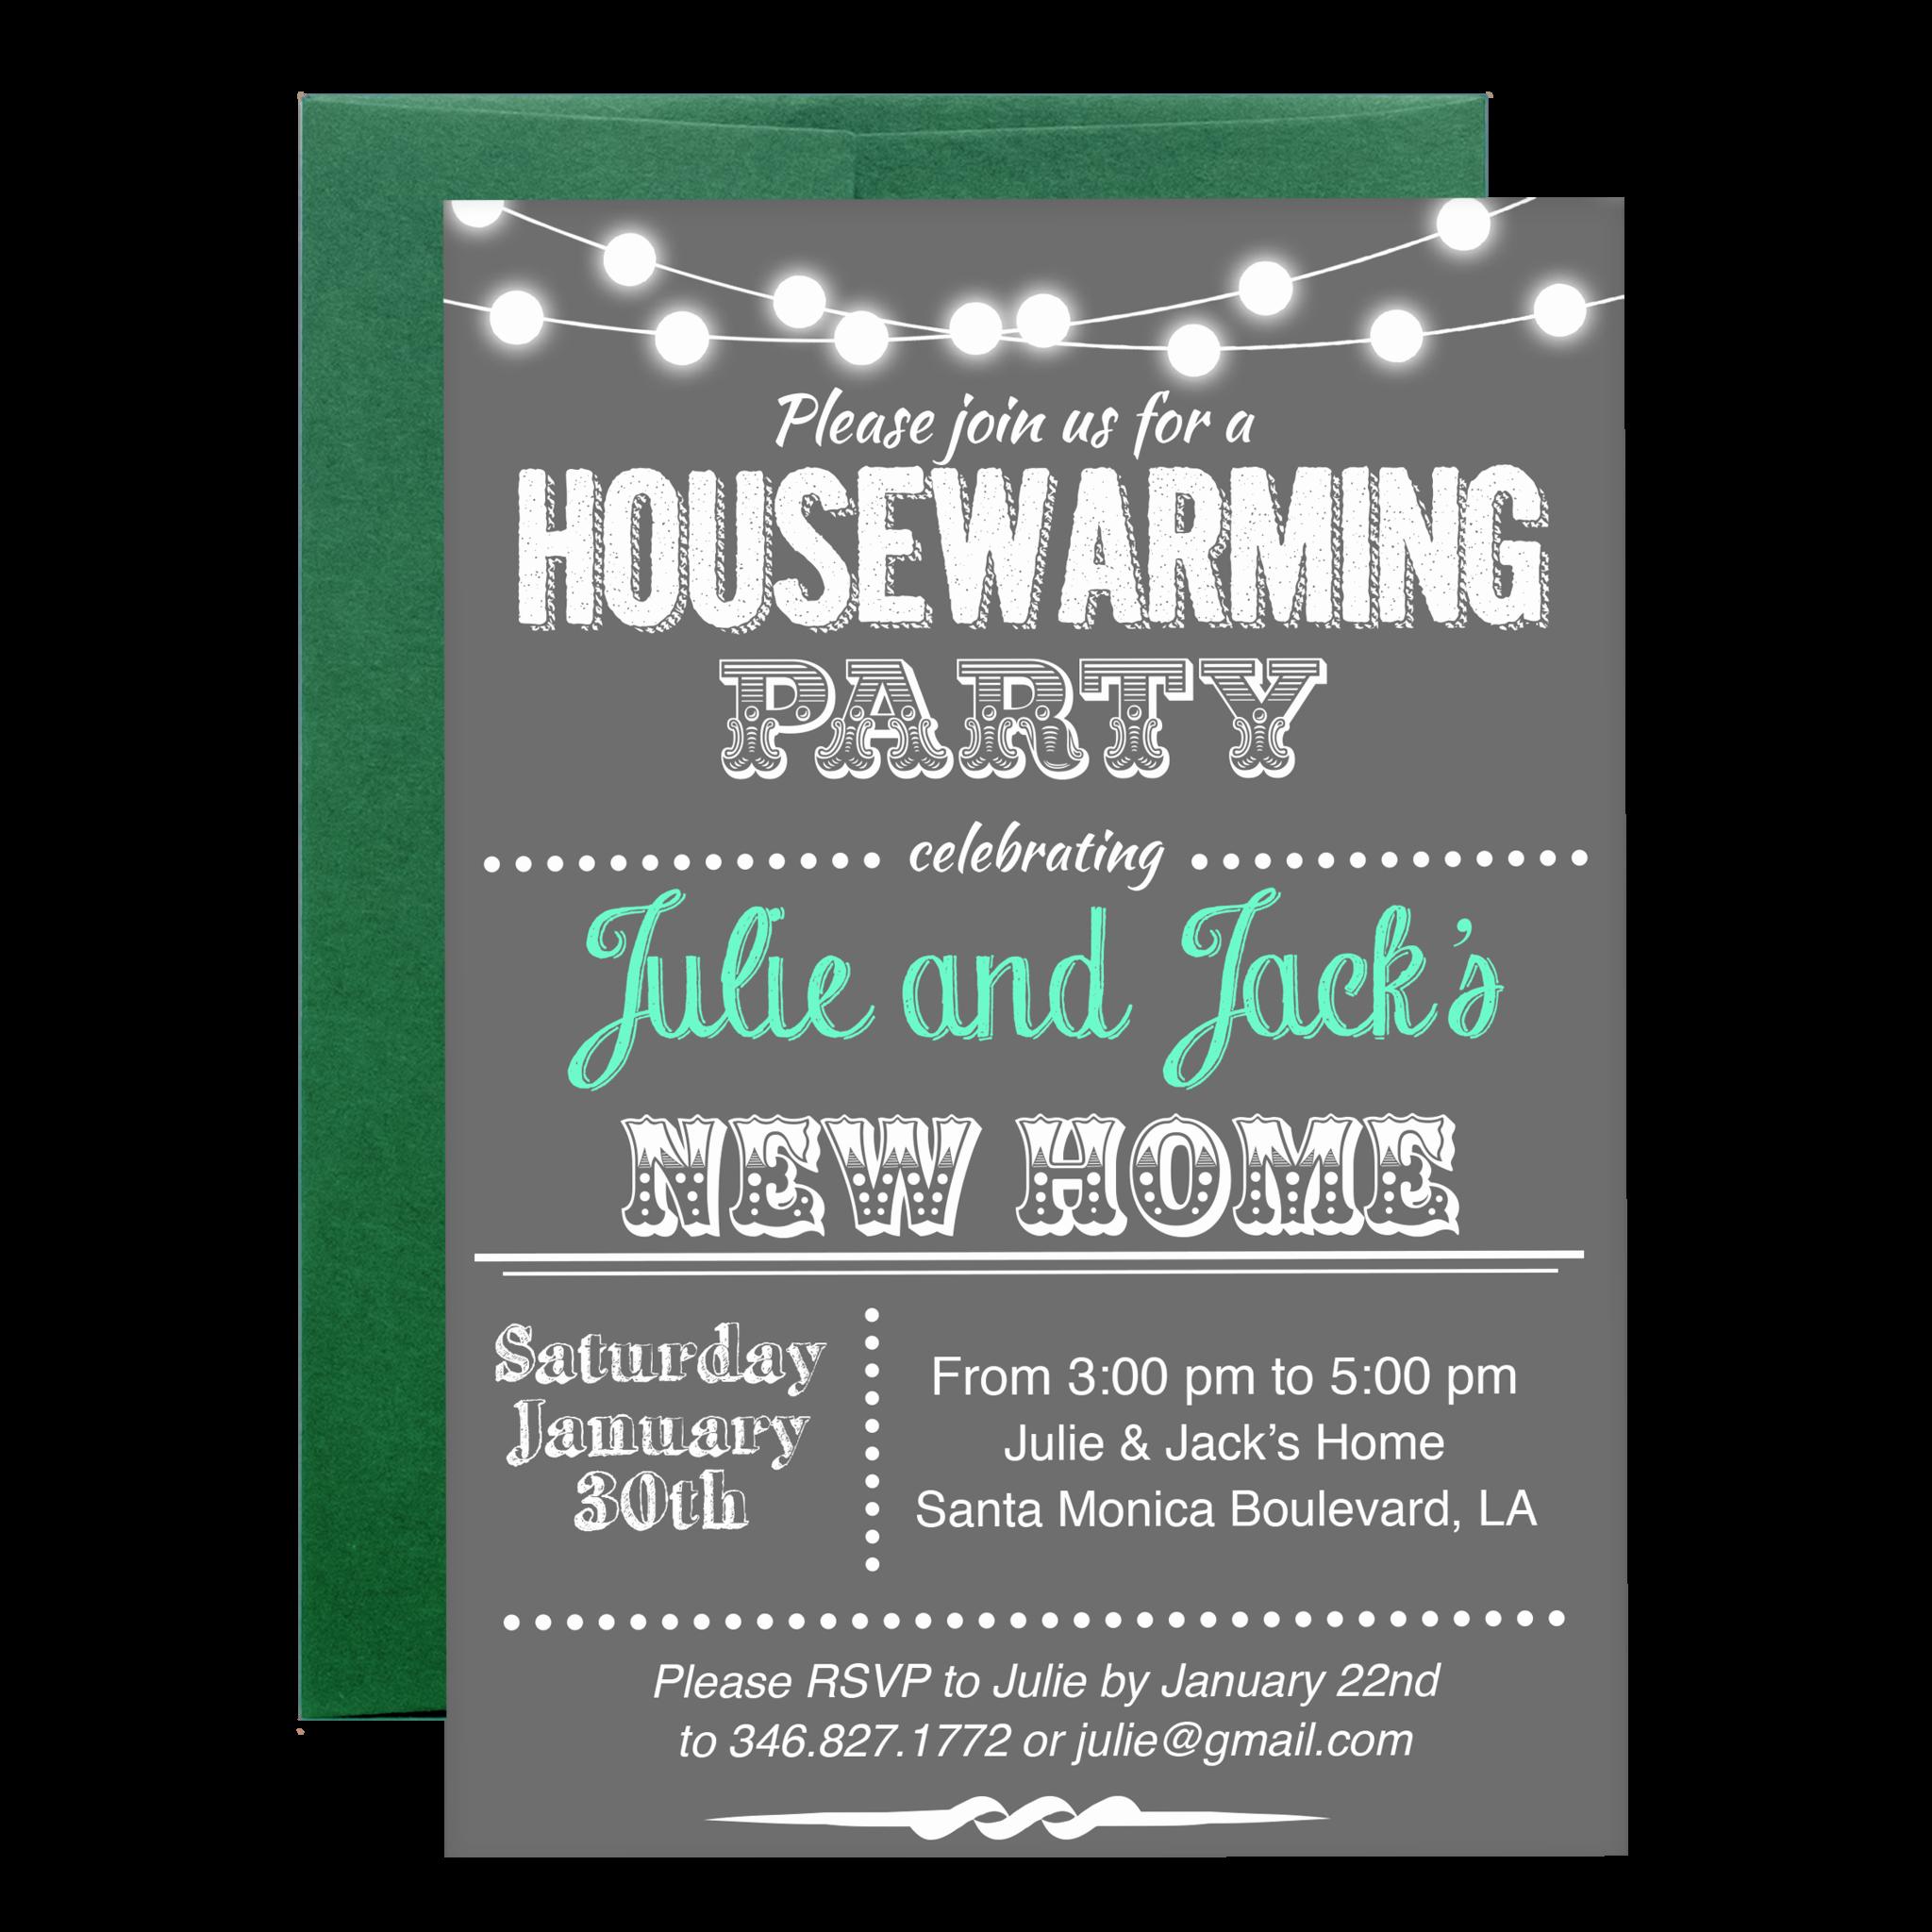 Free Housewarming Invitation Template Fresh Ideas Housewarming Invitation Templates